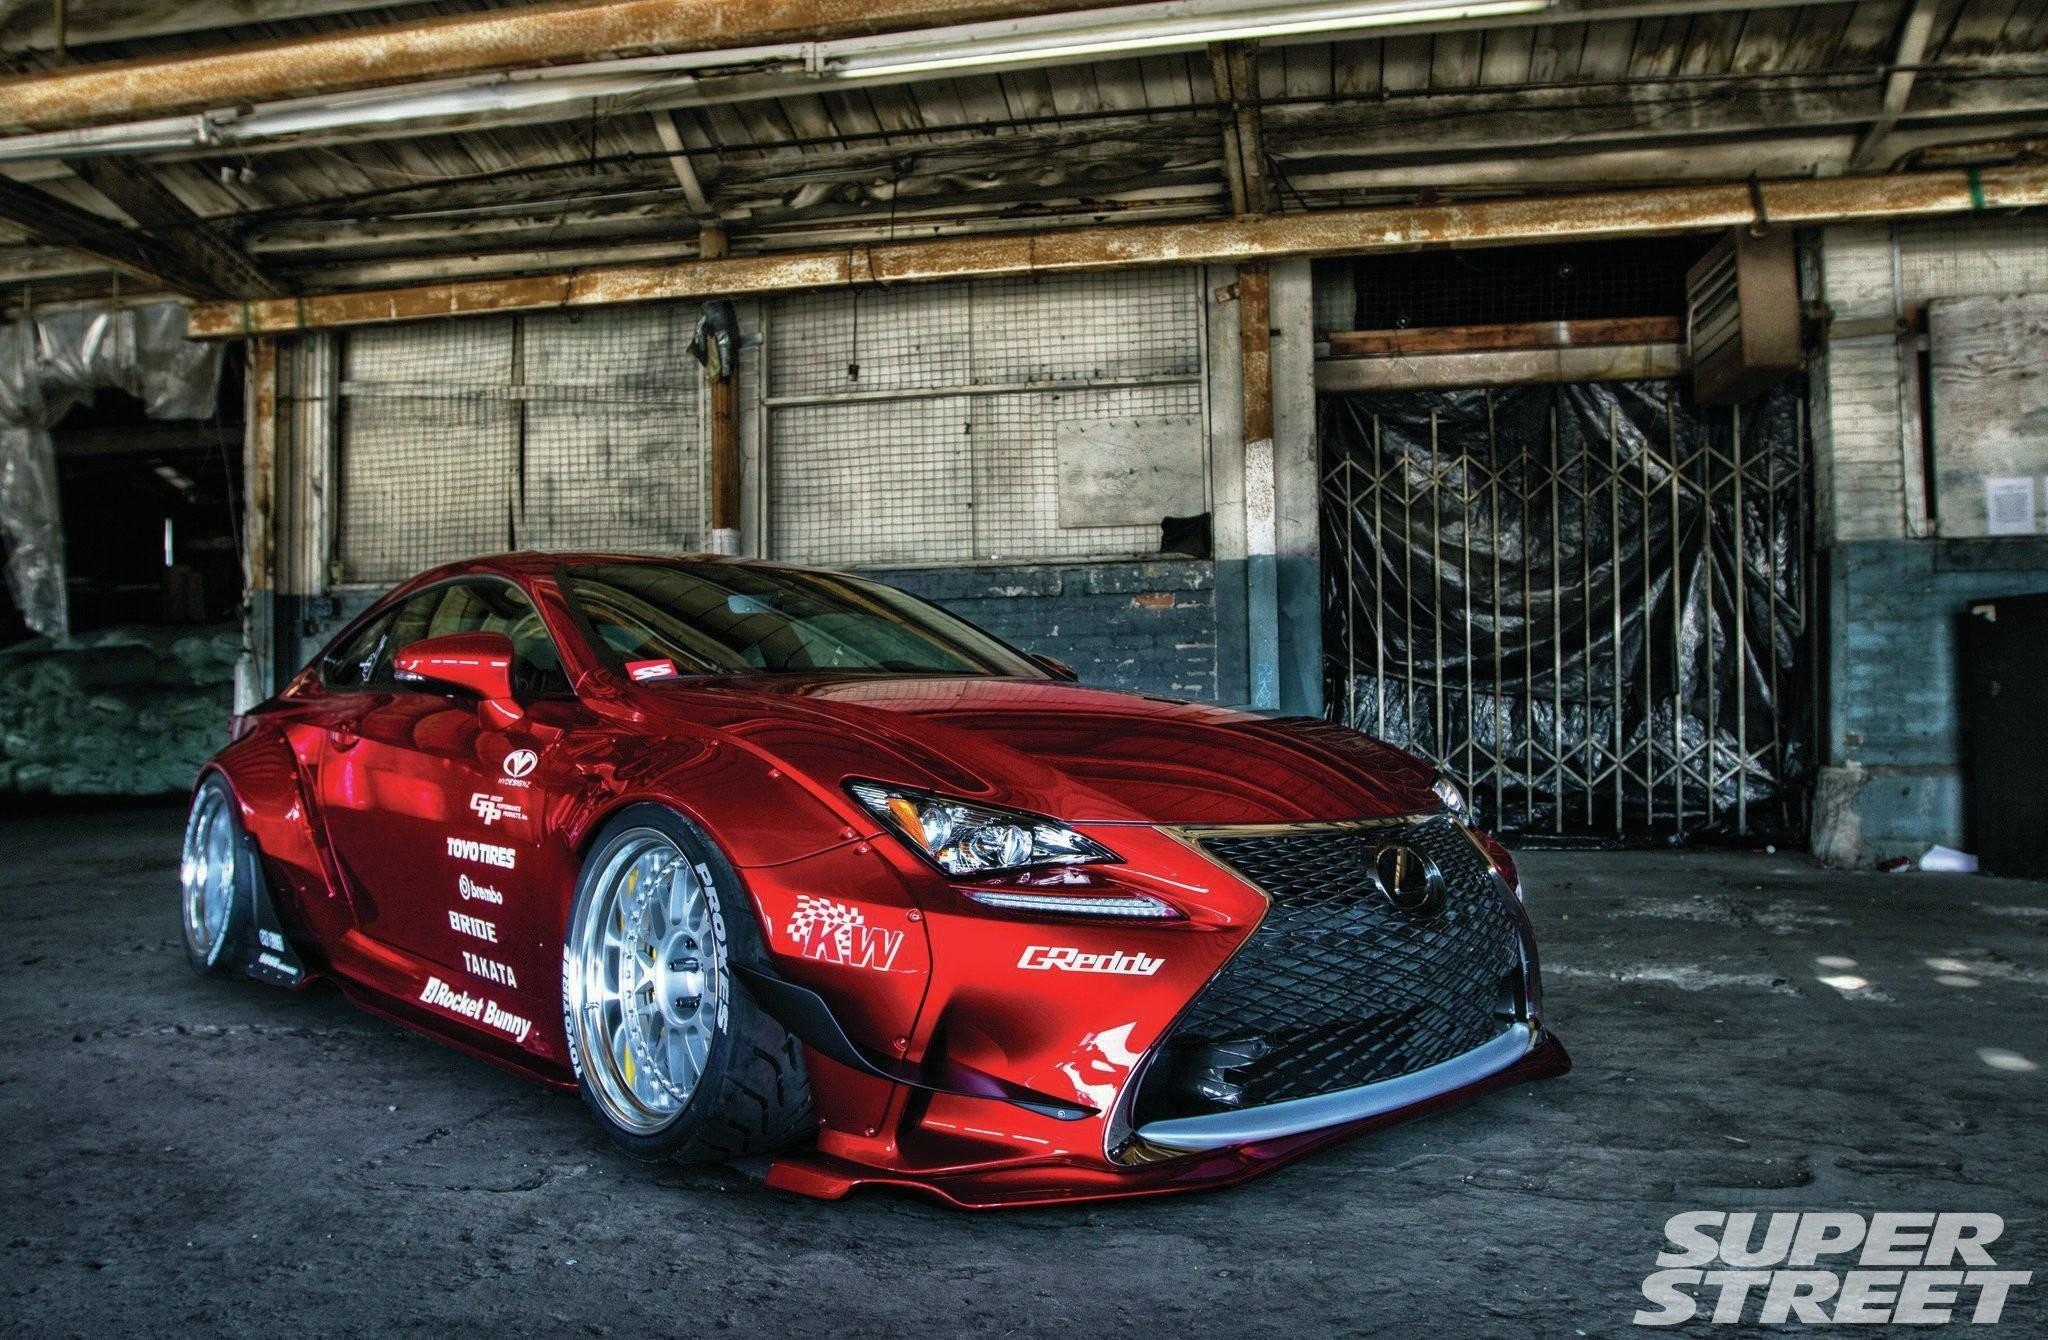 Rocket Bunny 2015 Lexus RC-F Sport tuning bodykit wallpaper      658678   WallpaperUP